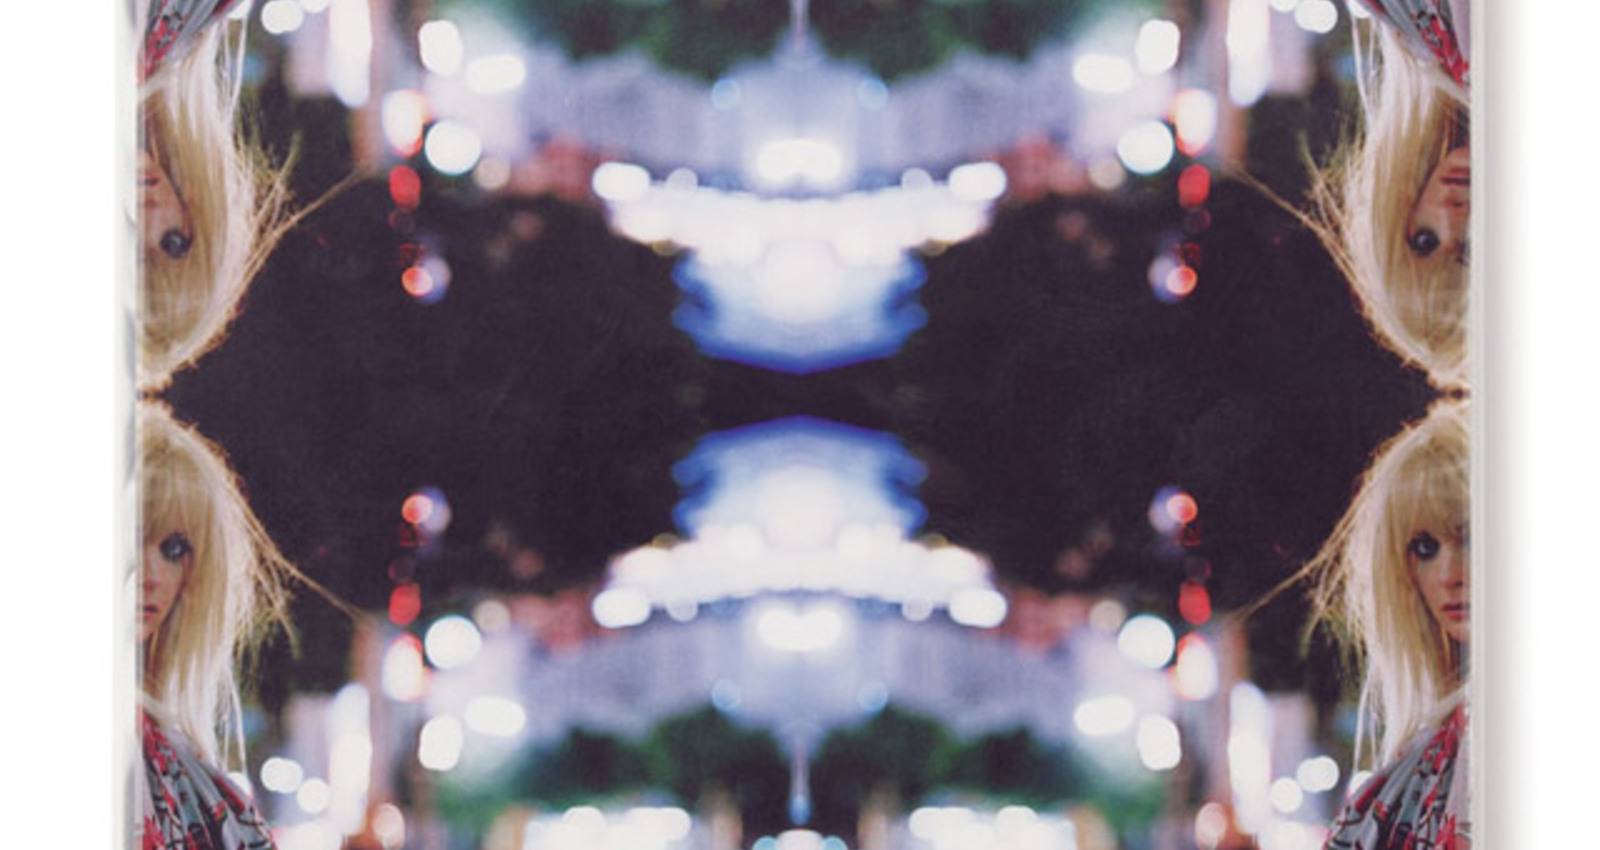 Patrik Andersson, Kaleidoscope